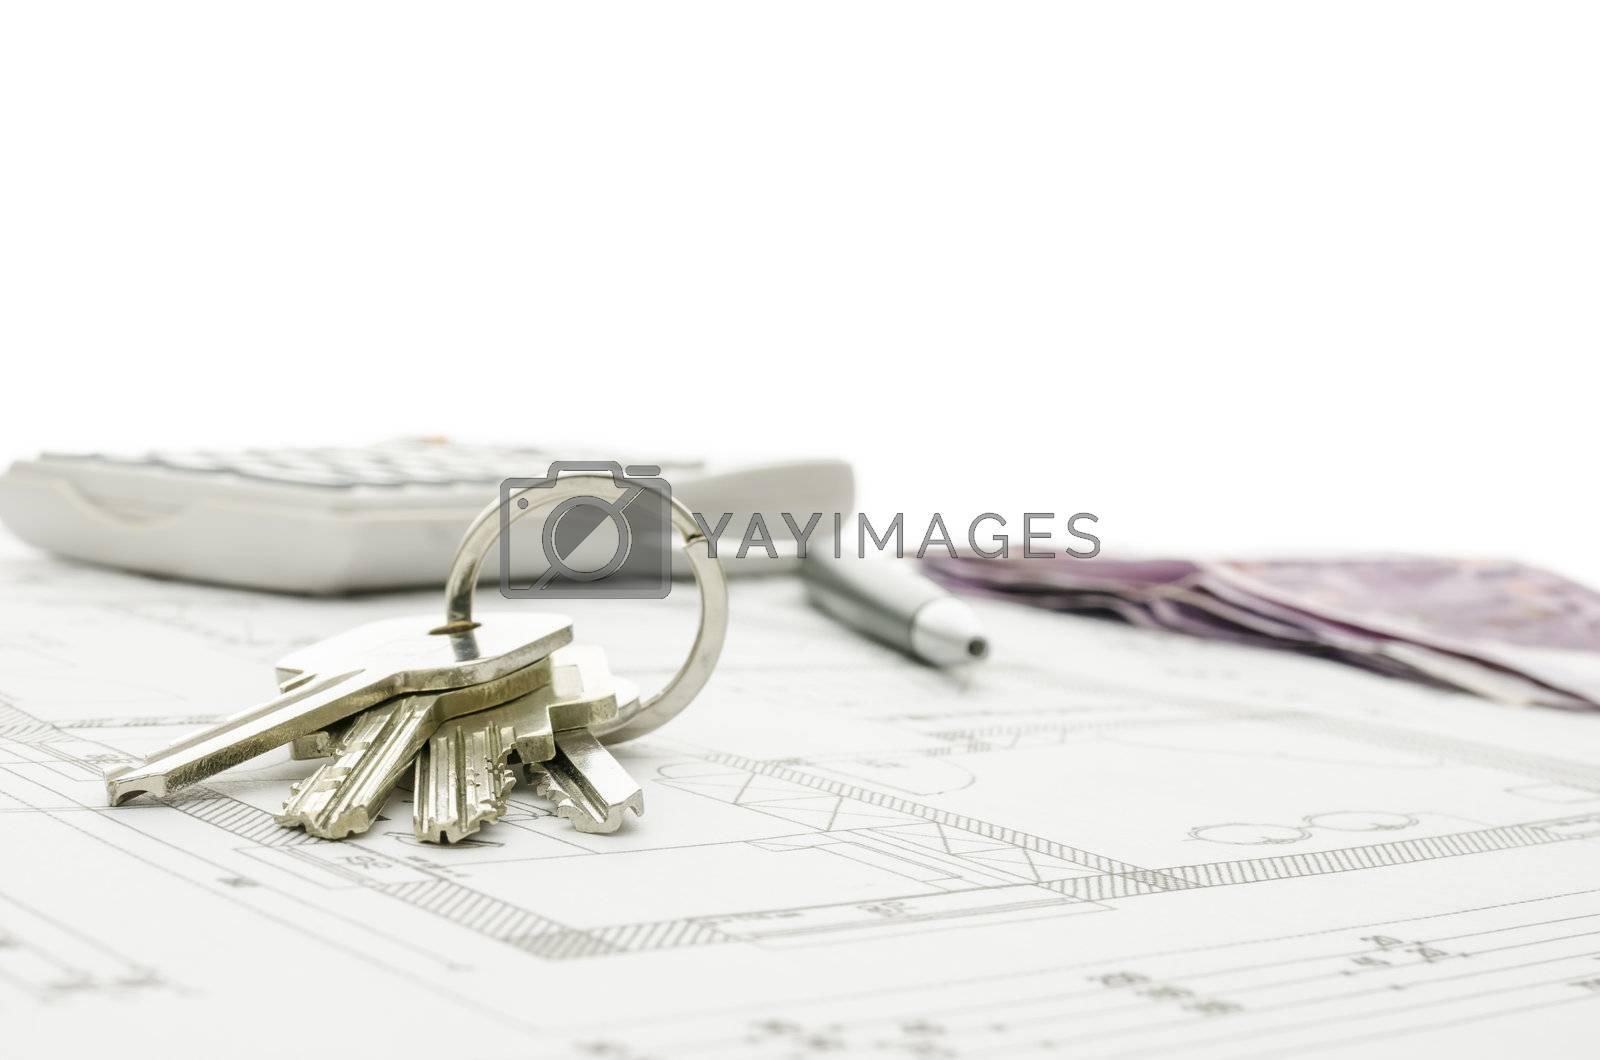 New house keys on blueprint. Copy space.